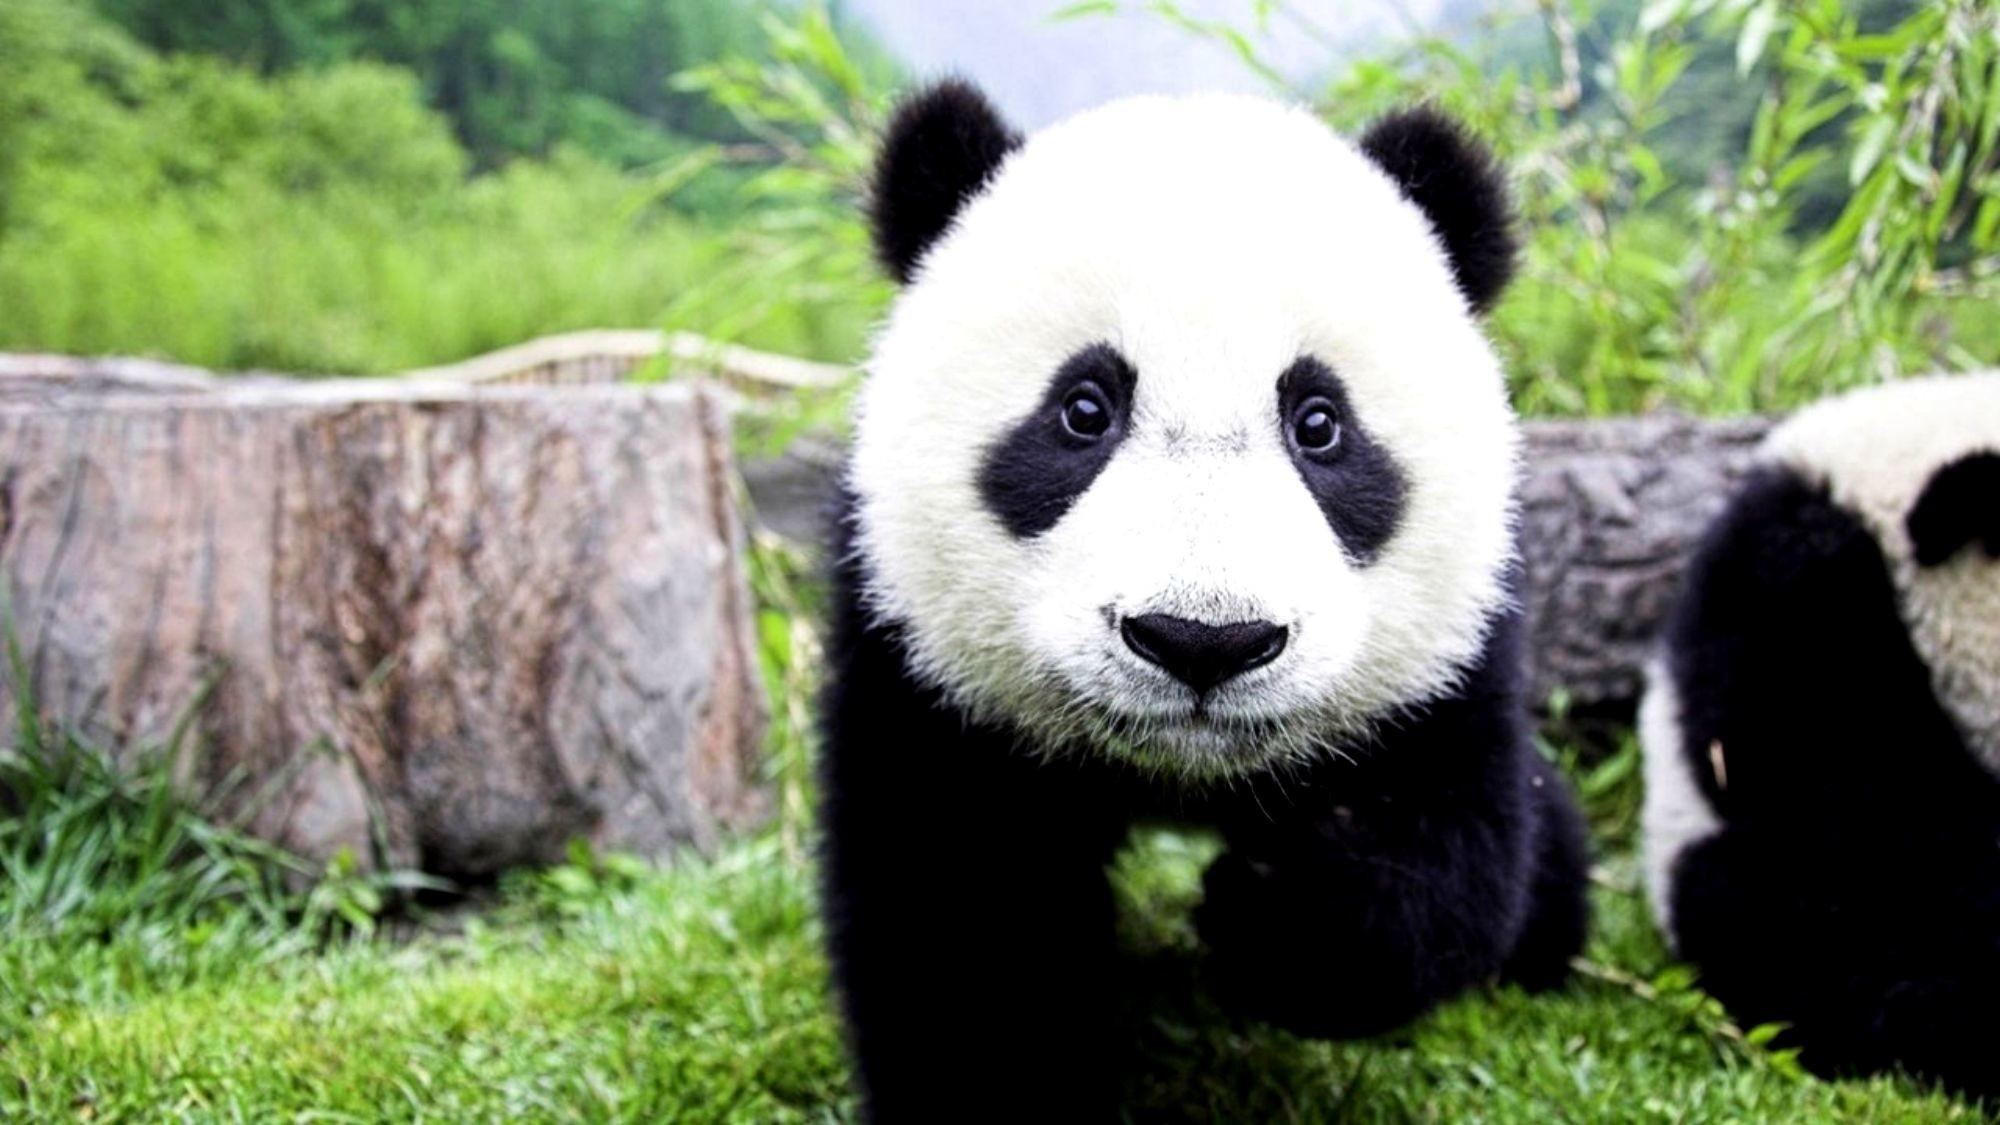 Res: 2000x1125, HD Wallpaper   Background Image ID:390654.  Animal Panda